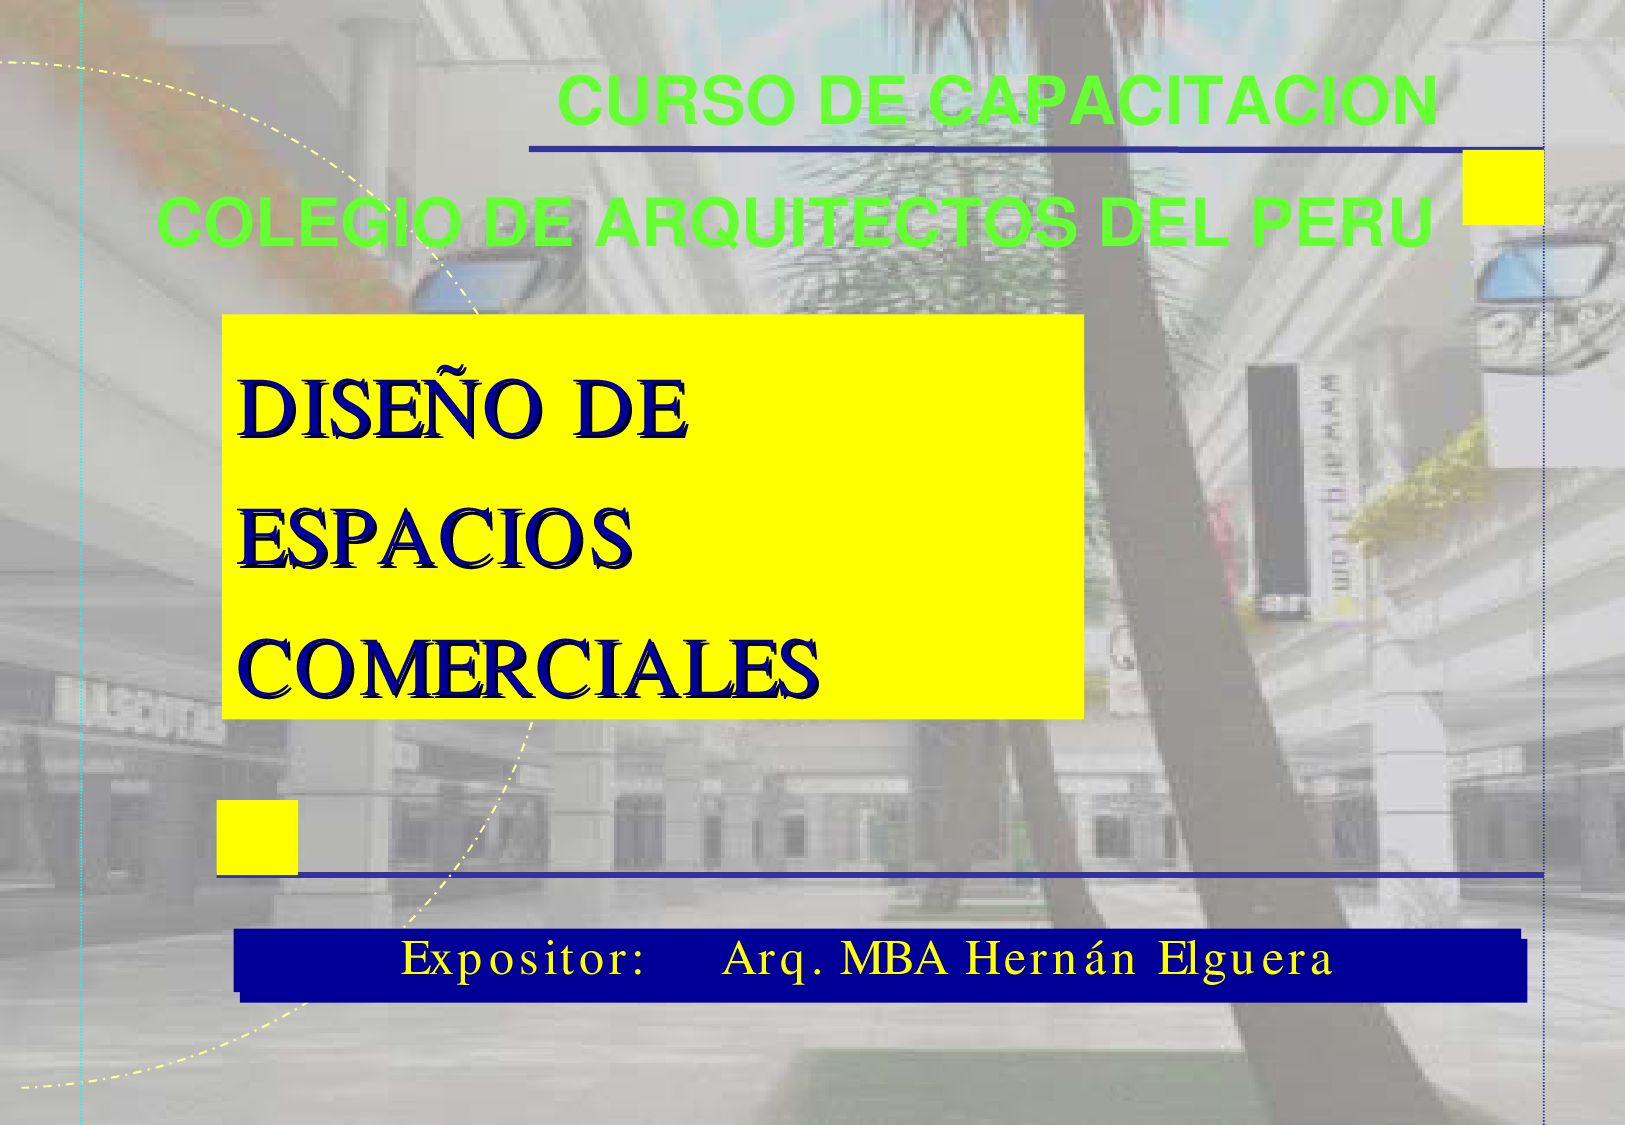 dise o de espacios comerciales 12 by gonzalo chong issuu